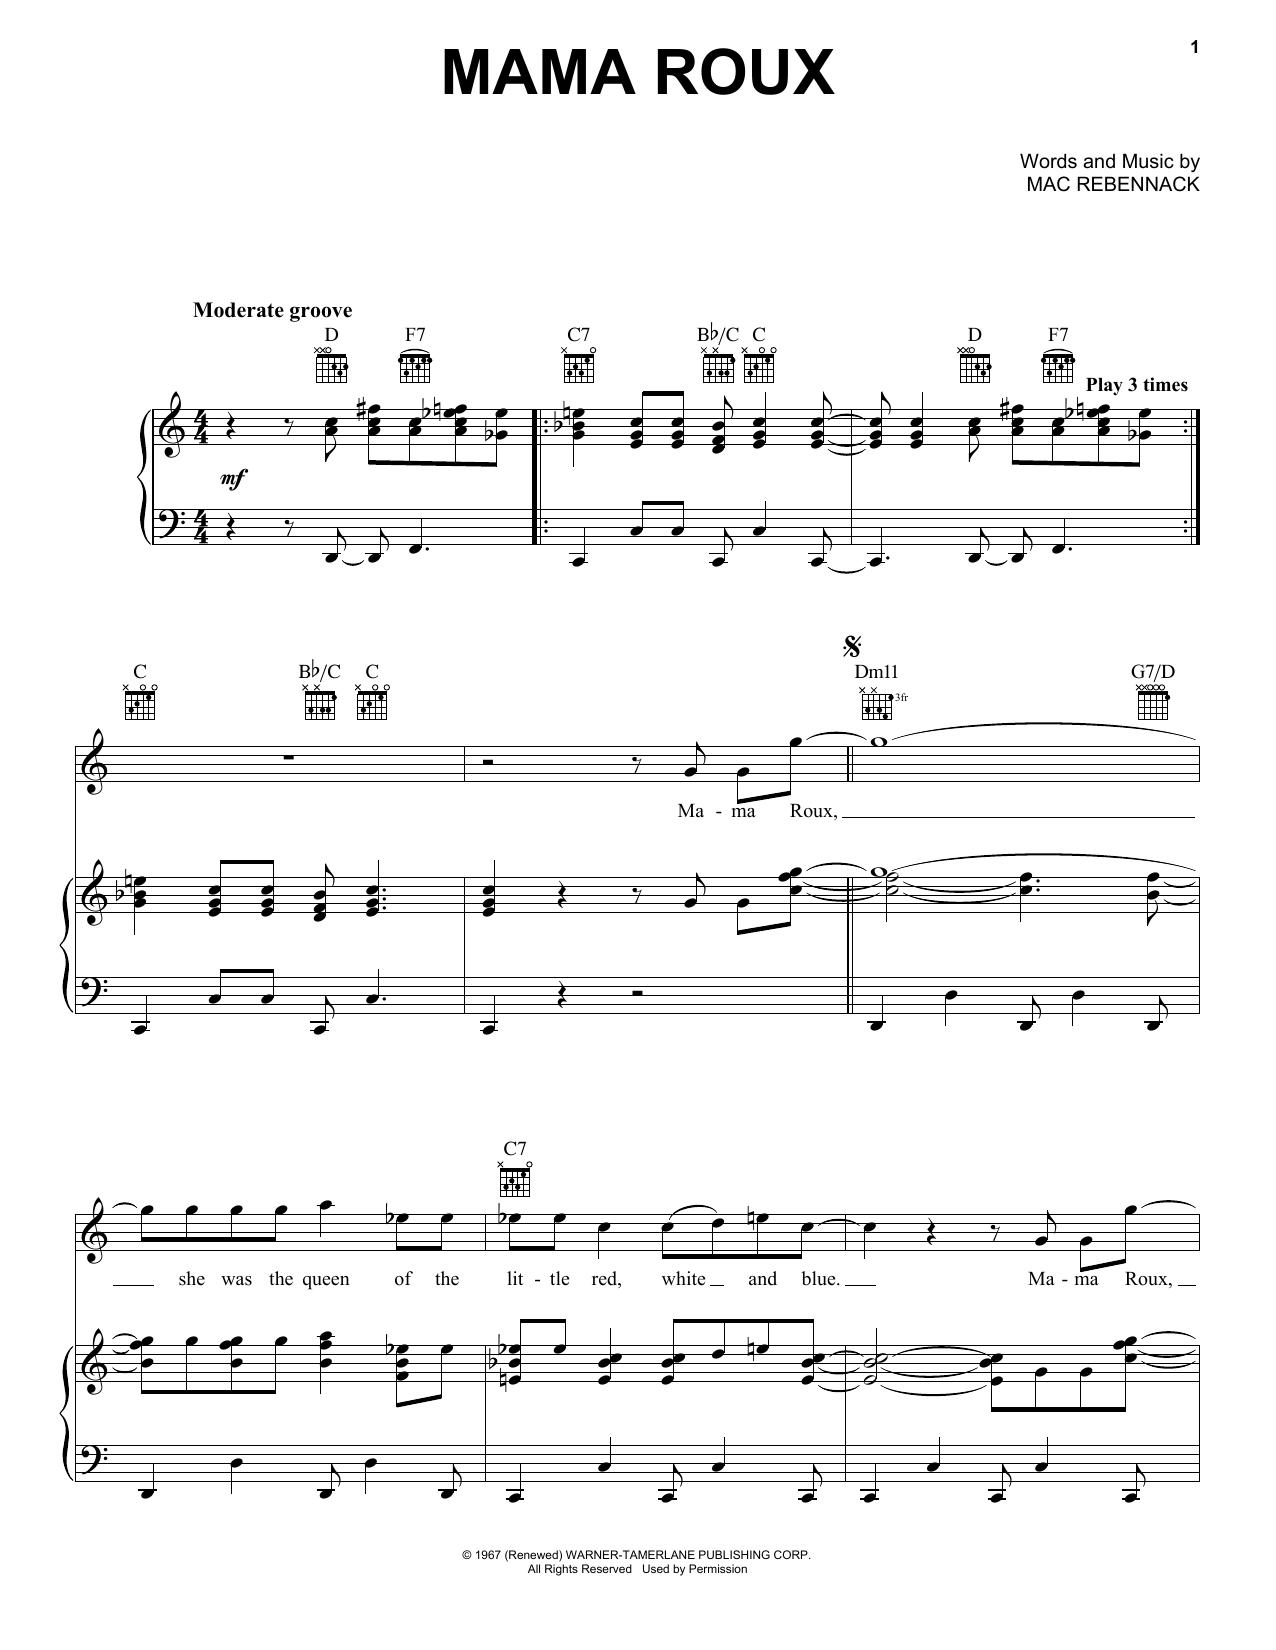 Dr  John 'Mama Roux' Sheet Music Notes, Chords | Download Printable Piano,  Vocal & Guitar (Right-Hand Melody) - SKU: 410180